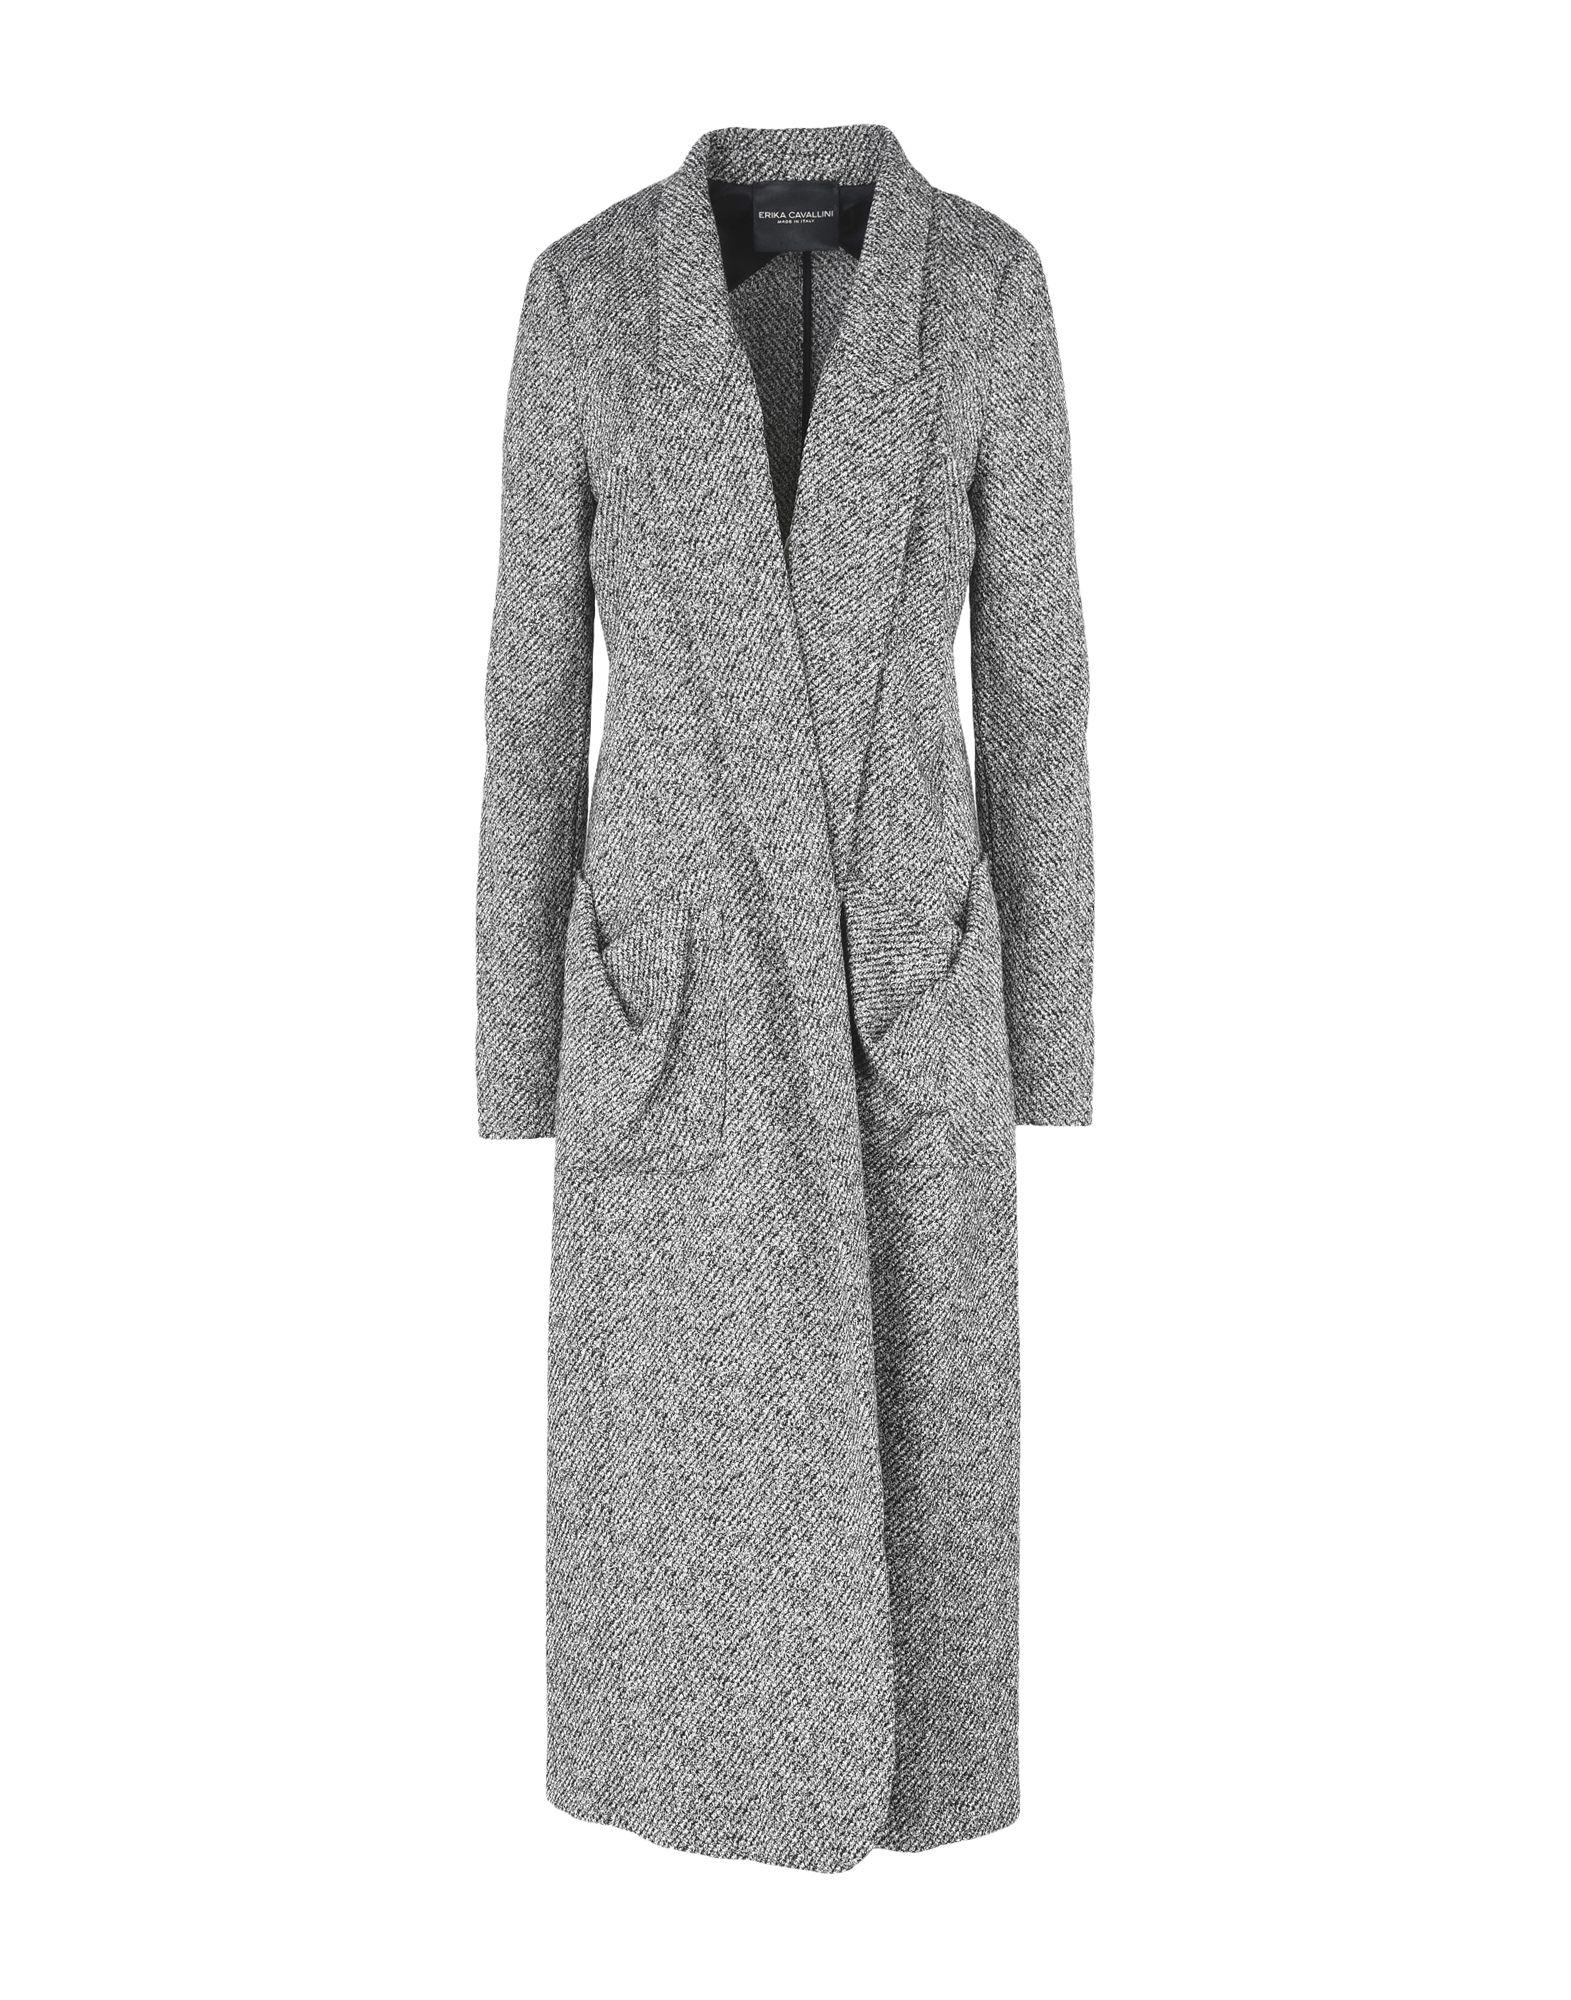 ERIKA CAVALLINI Damen Lange Jacke Farbe Schwarz Größe 5